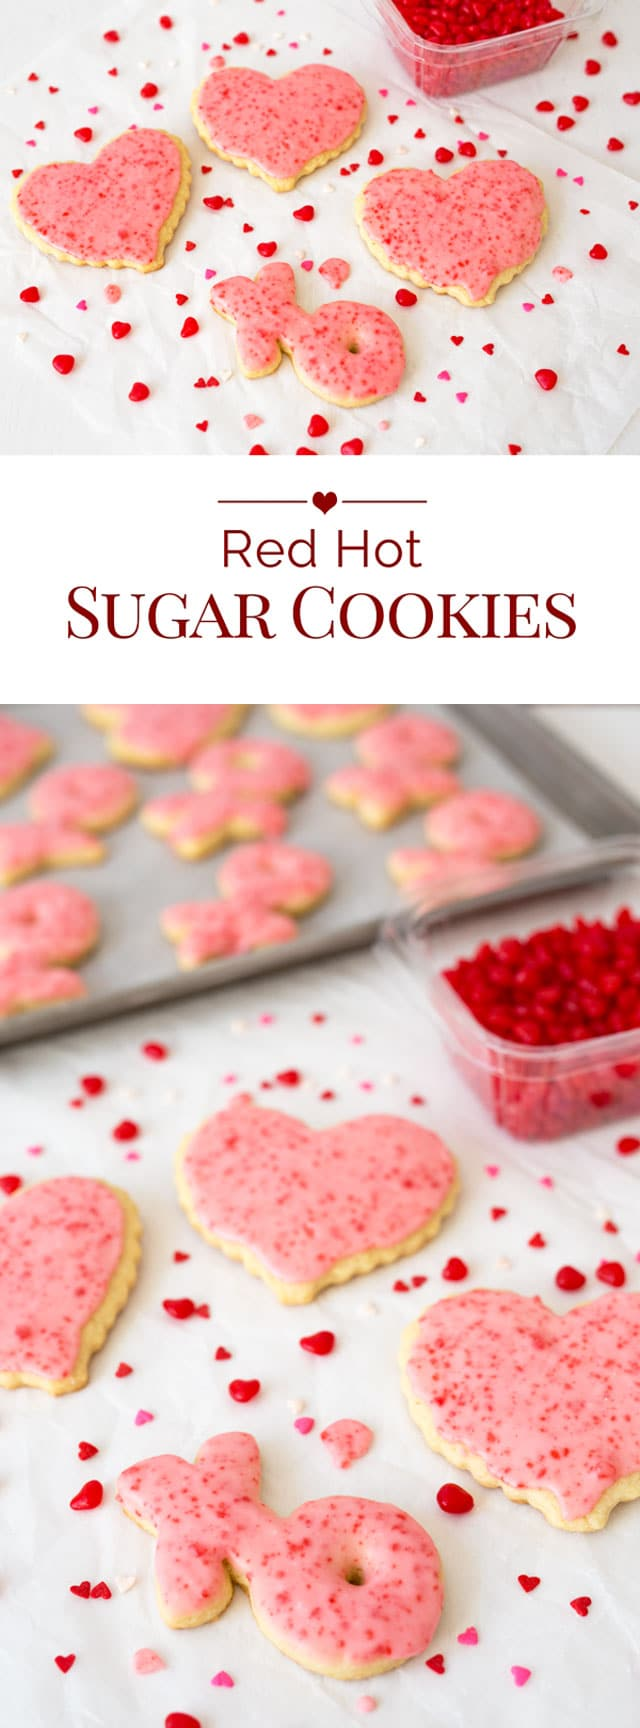 Red-Hot-Sugar-Cookies-Collage-Barbara-Bakes